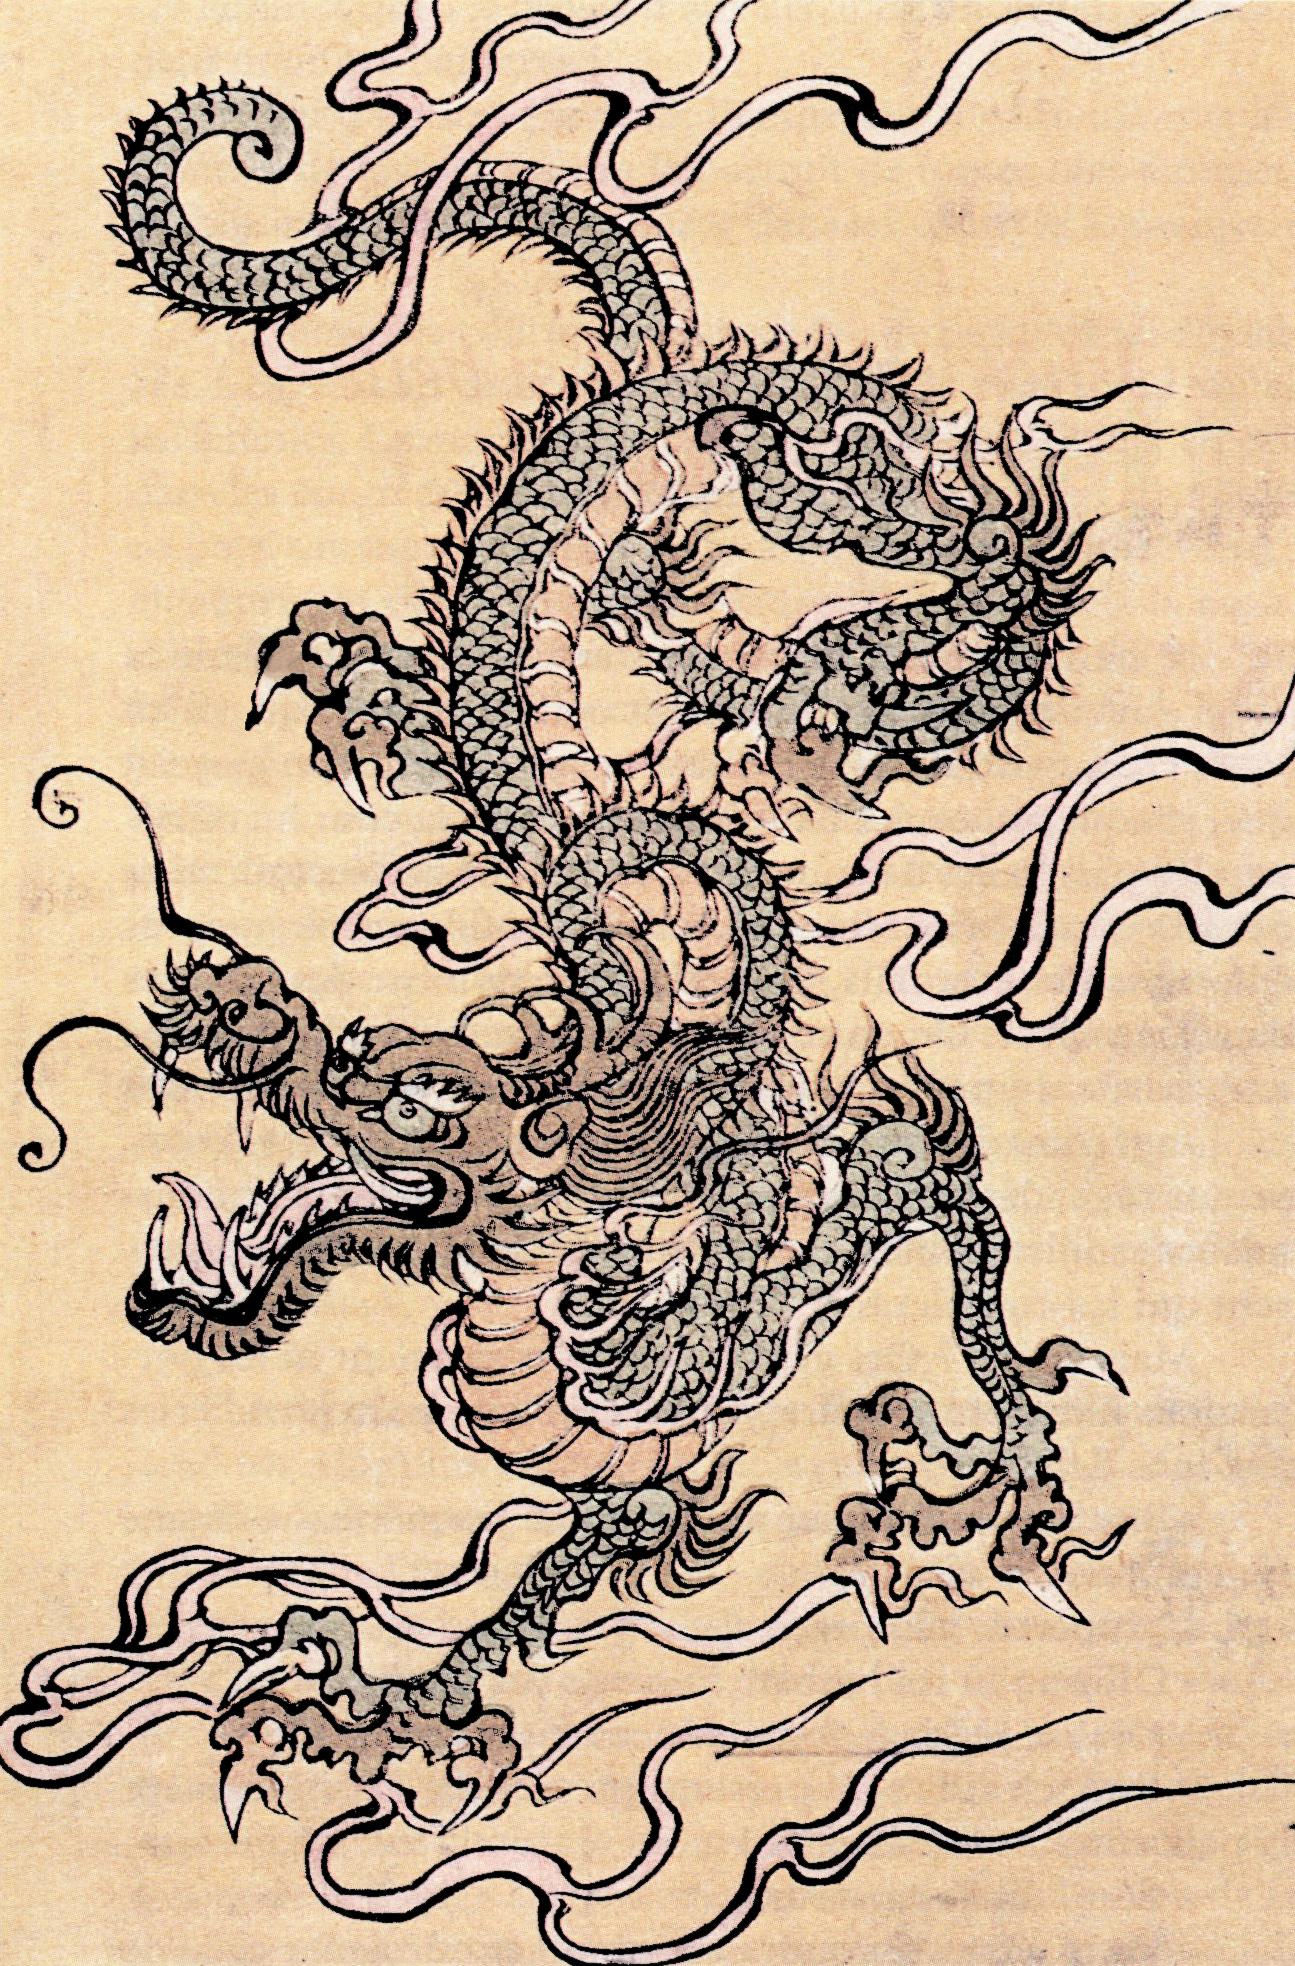 http://upload.wikimedia.org/wikipedia/commons/e/e3/Japanese_dragon%2C_Chinese_school%2C_19th_Century.jpg